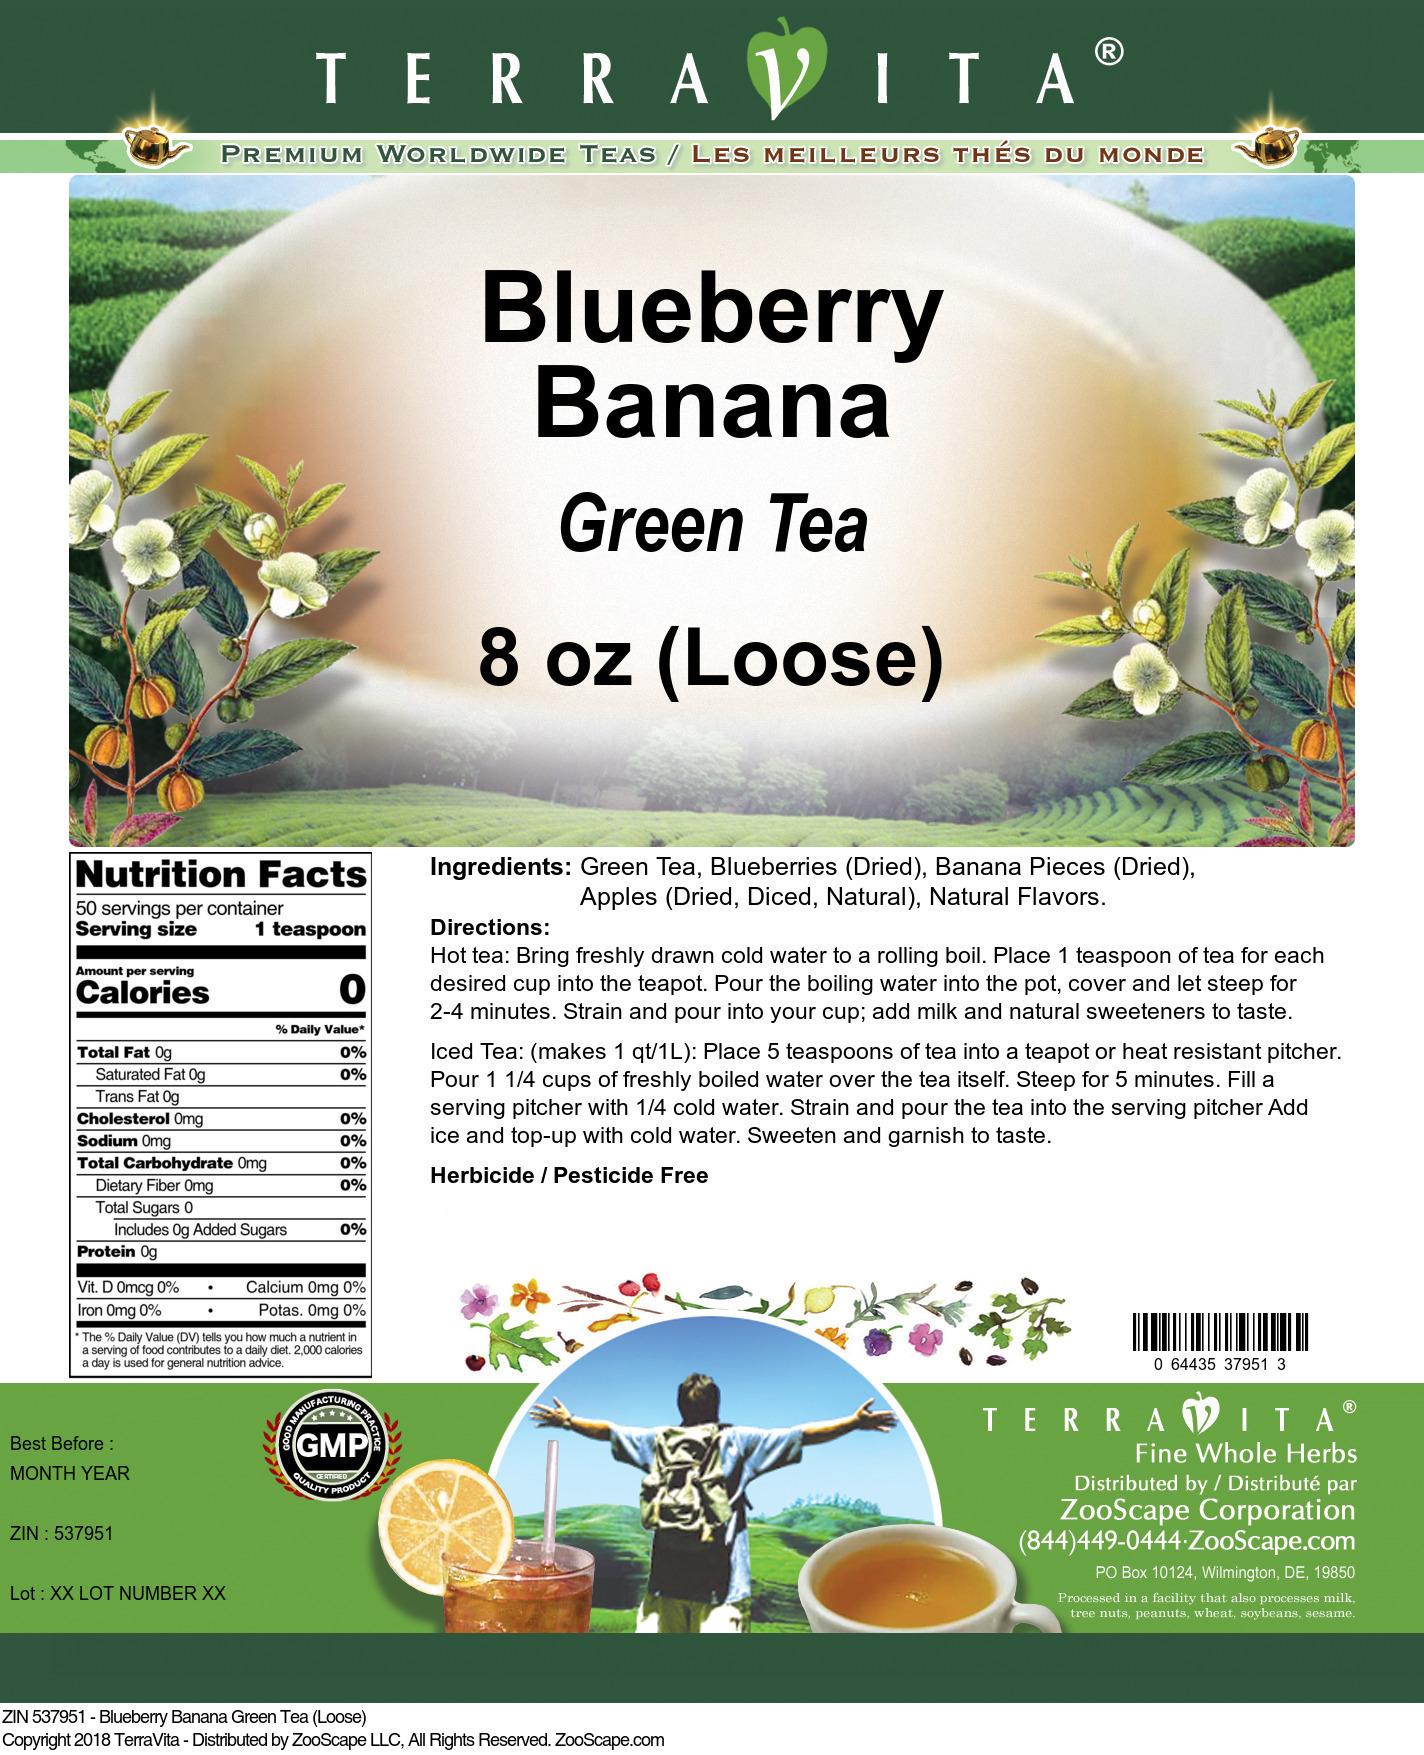 Blueberry Banana Green Tea (Loose)